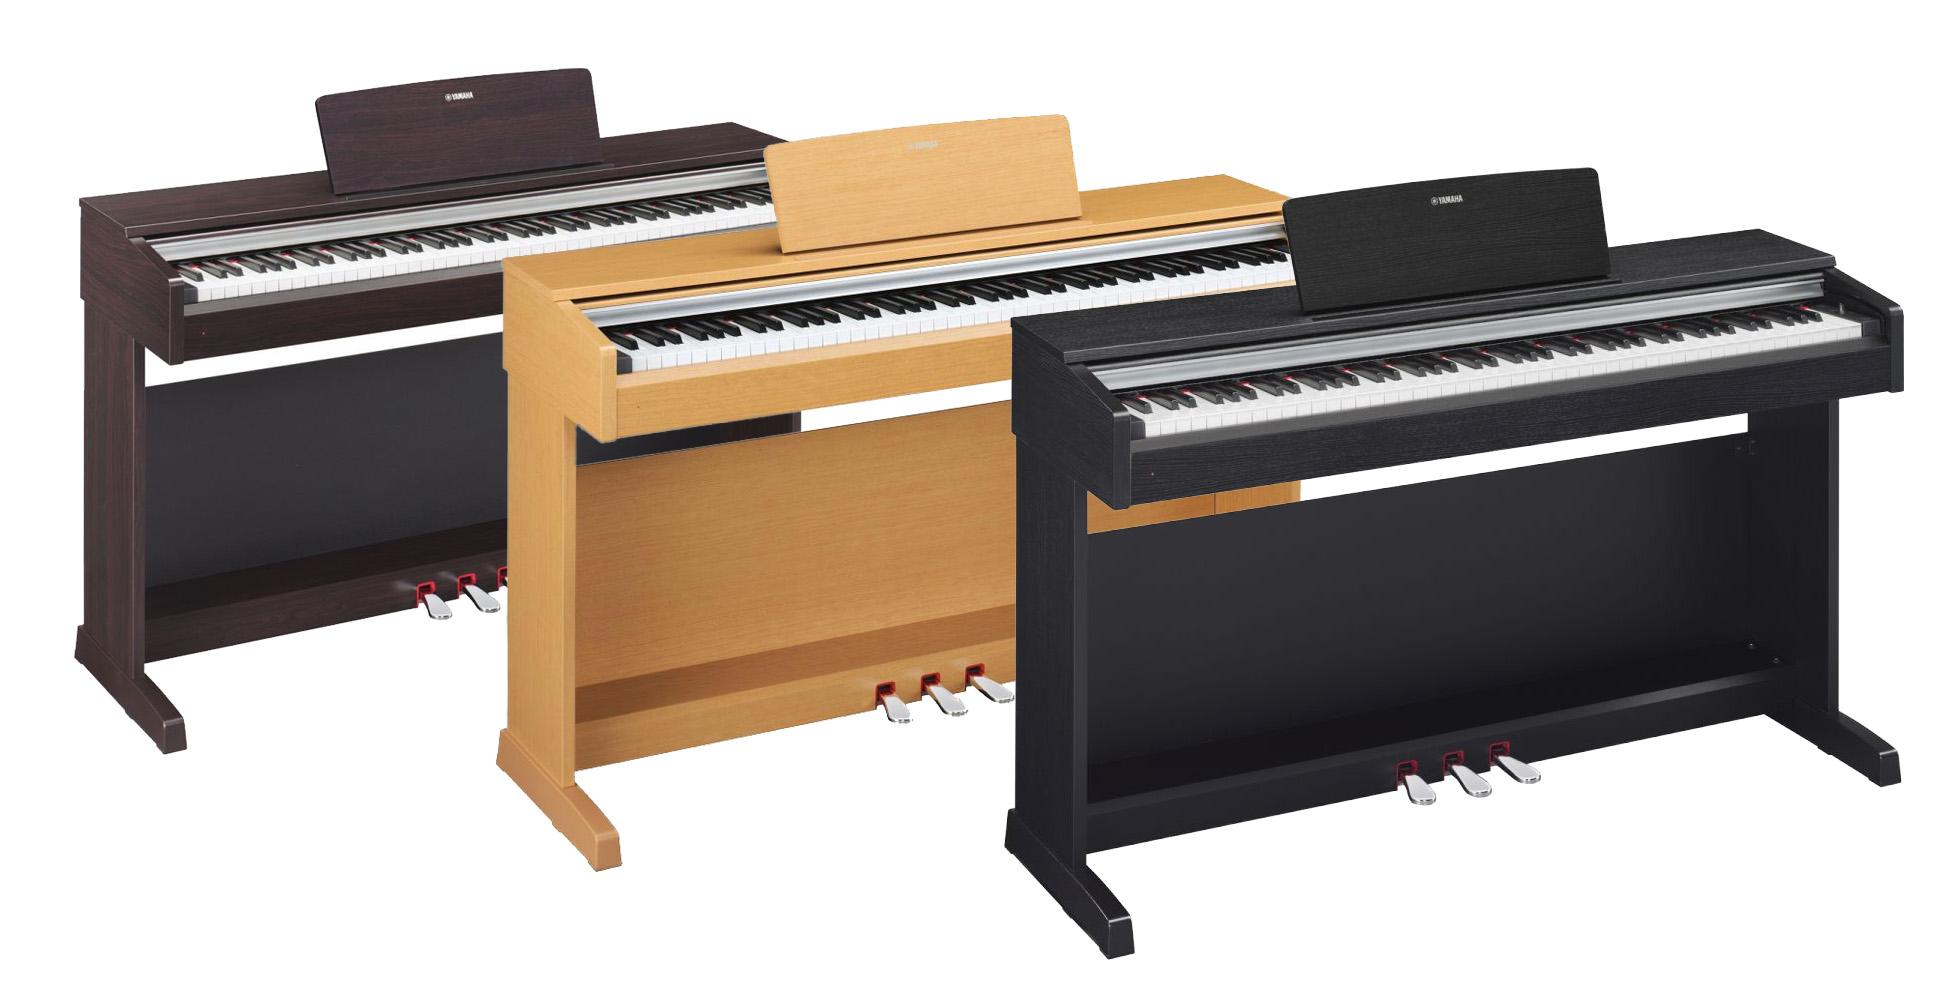 yamaha arius ydp 142 digital pianos various finishes. Black Bedroom Furniture Sets. Home Design Ideas